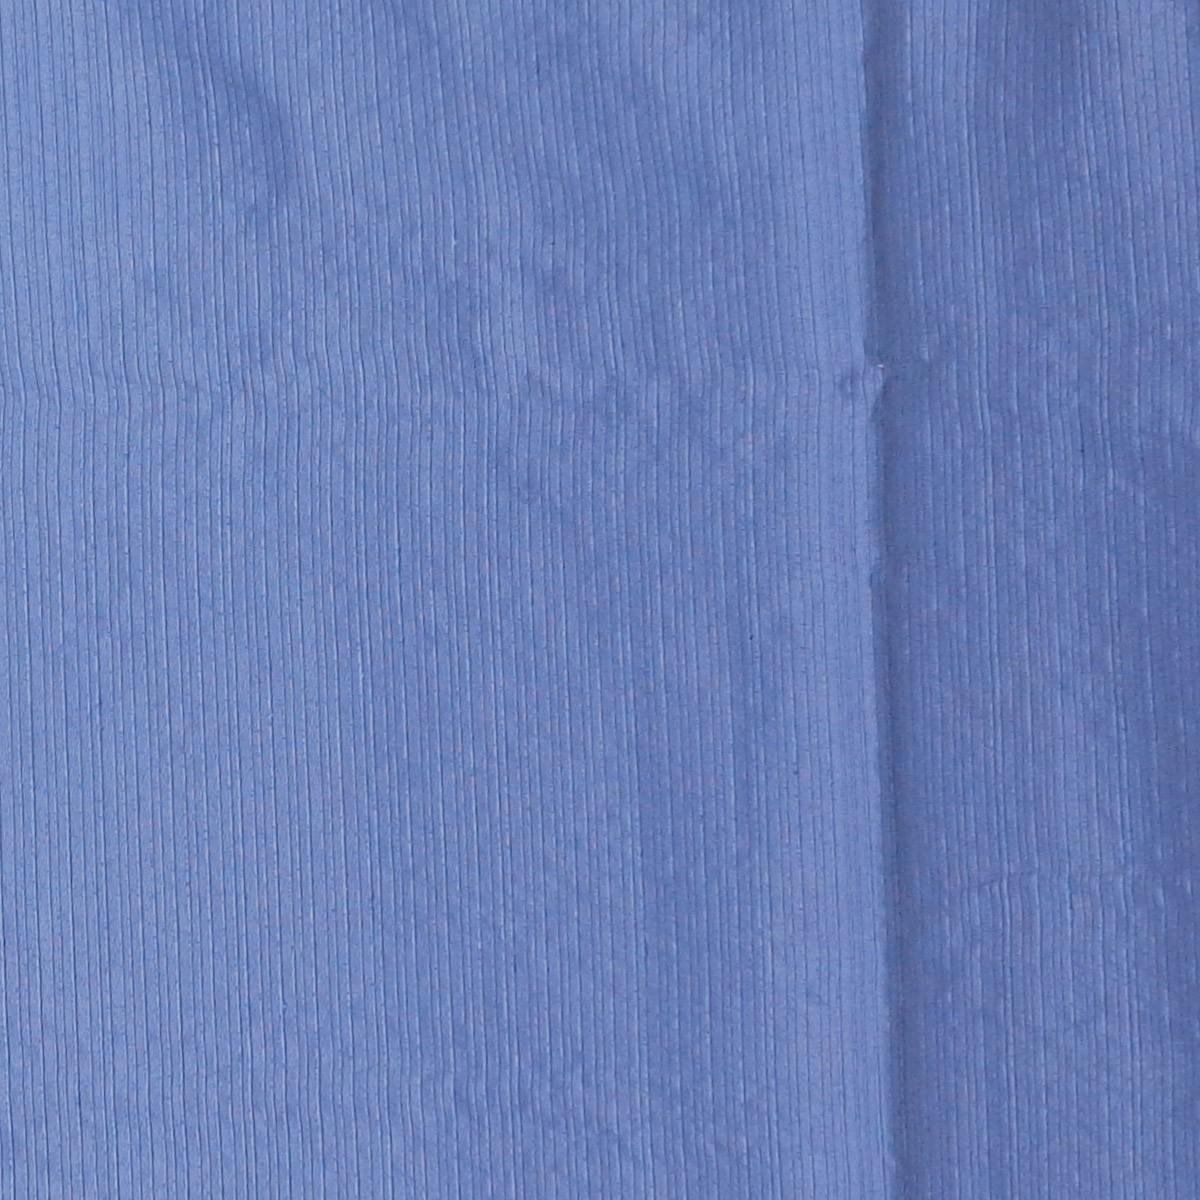 Cortina Para Sala Rústica Pantex Azul 2,60 x 2,30 Bella Janela